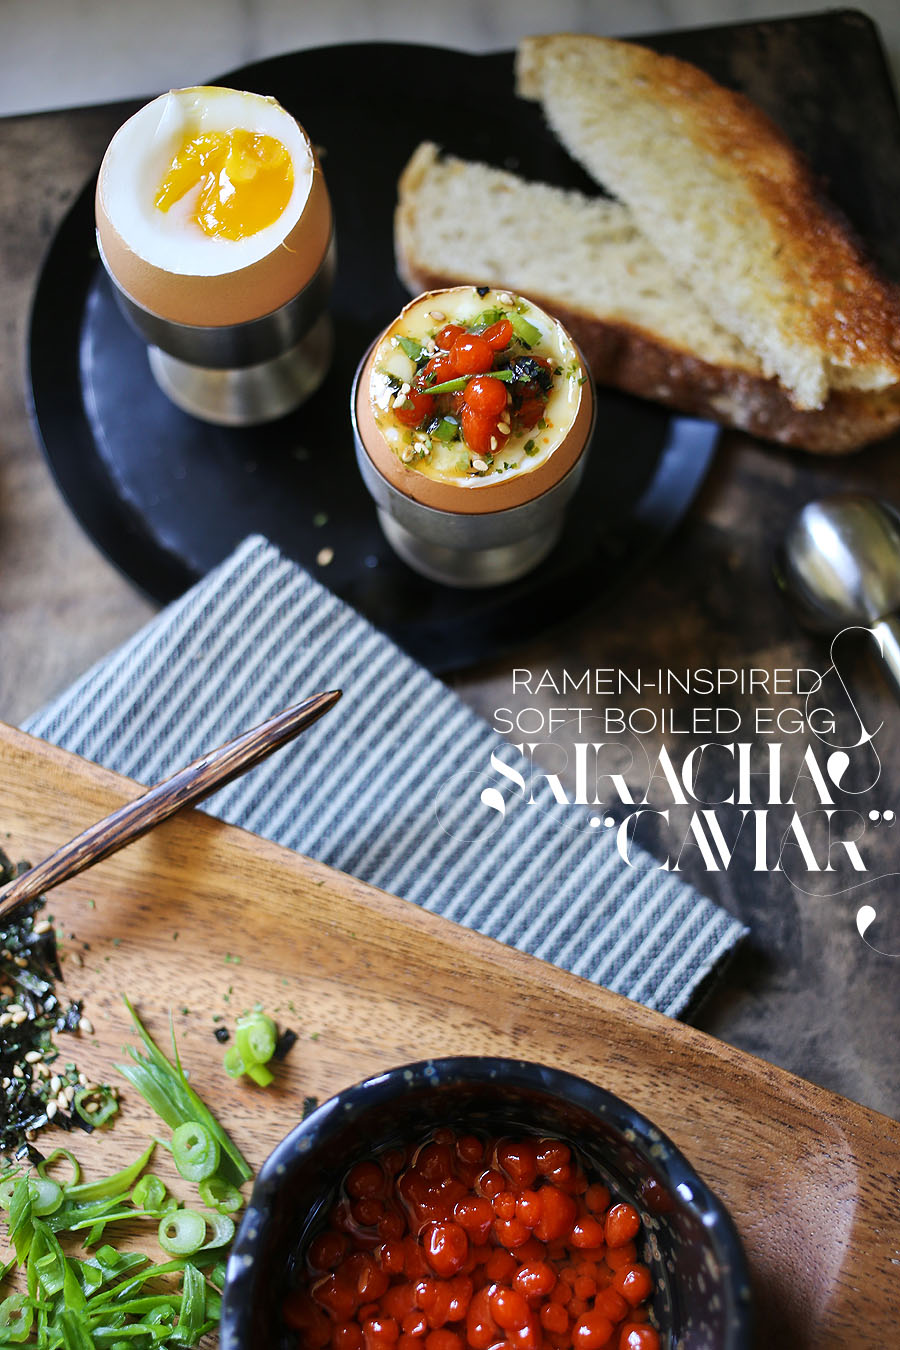 Ramen Inspired Egg With Sriracha Caviar Recipe | dinexdesign.com